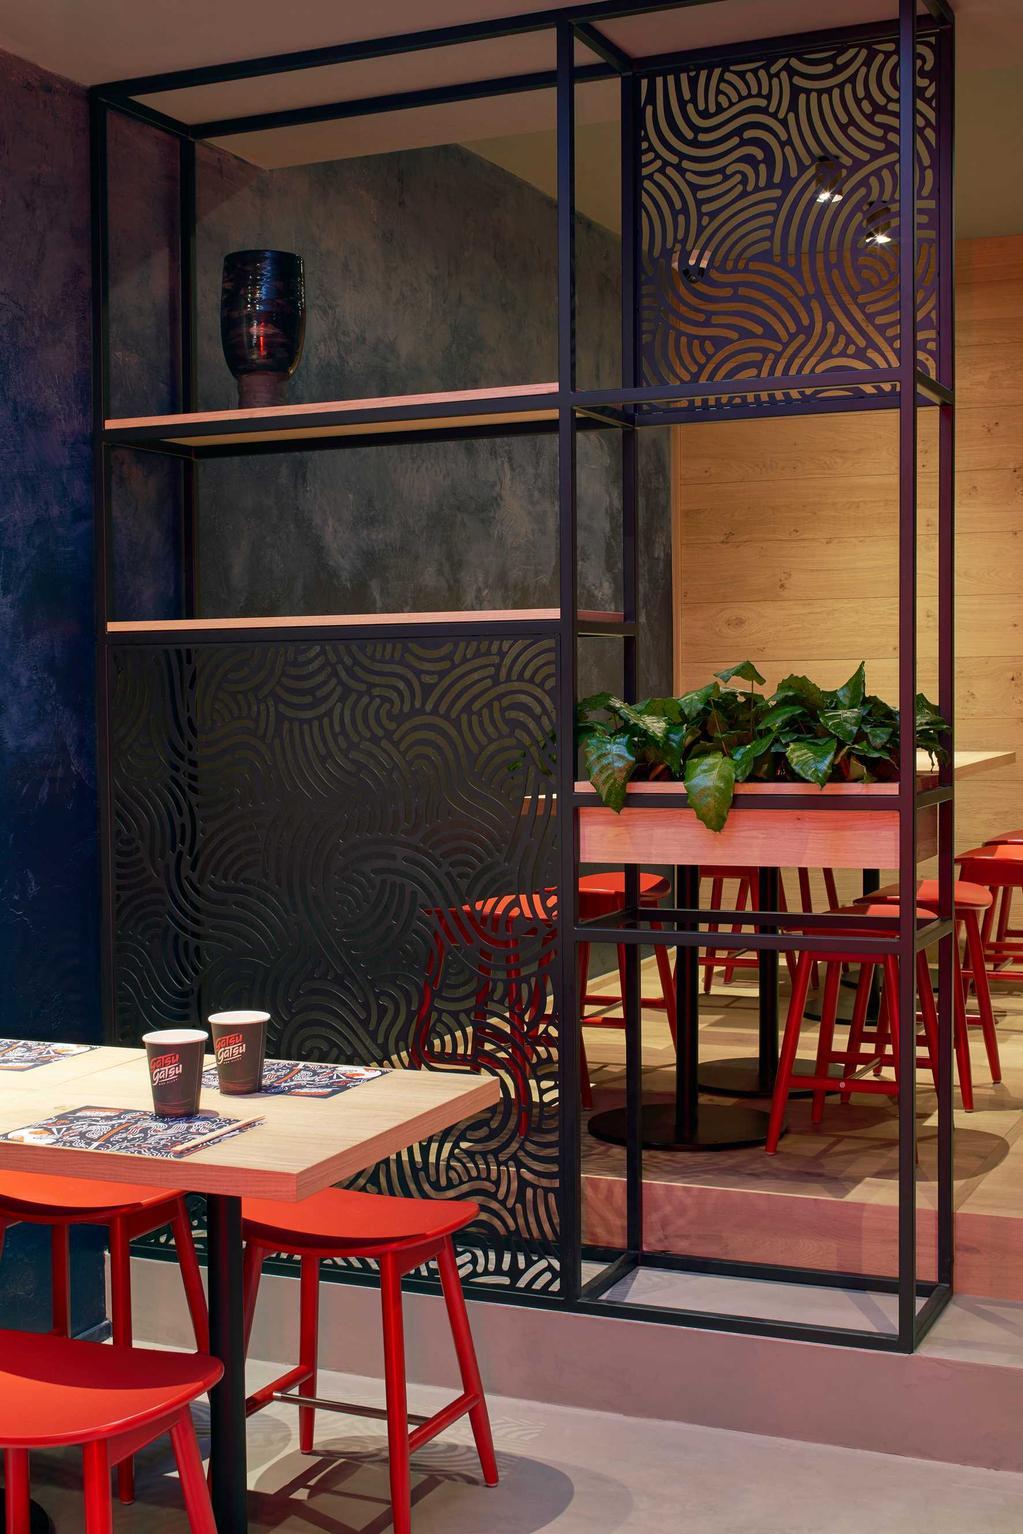 gatsugatsu interieur met groene muur en rode stoelen en plant